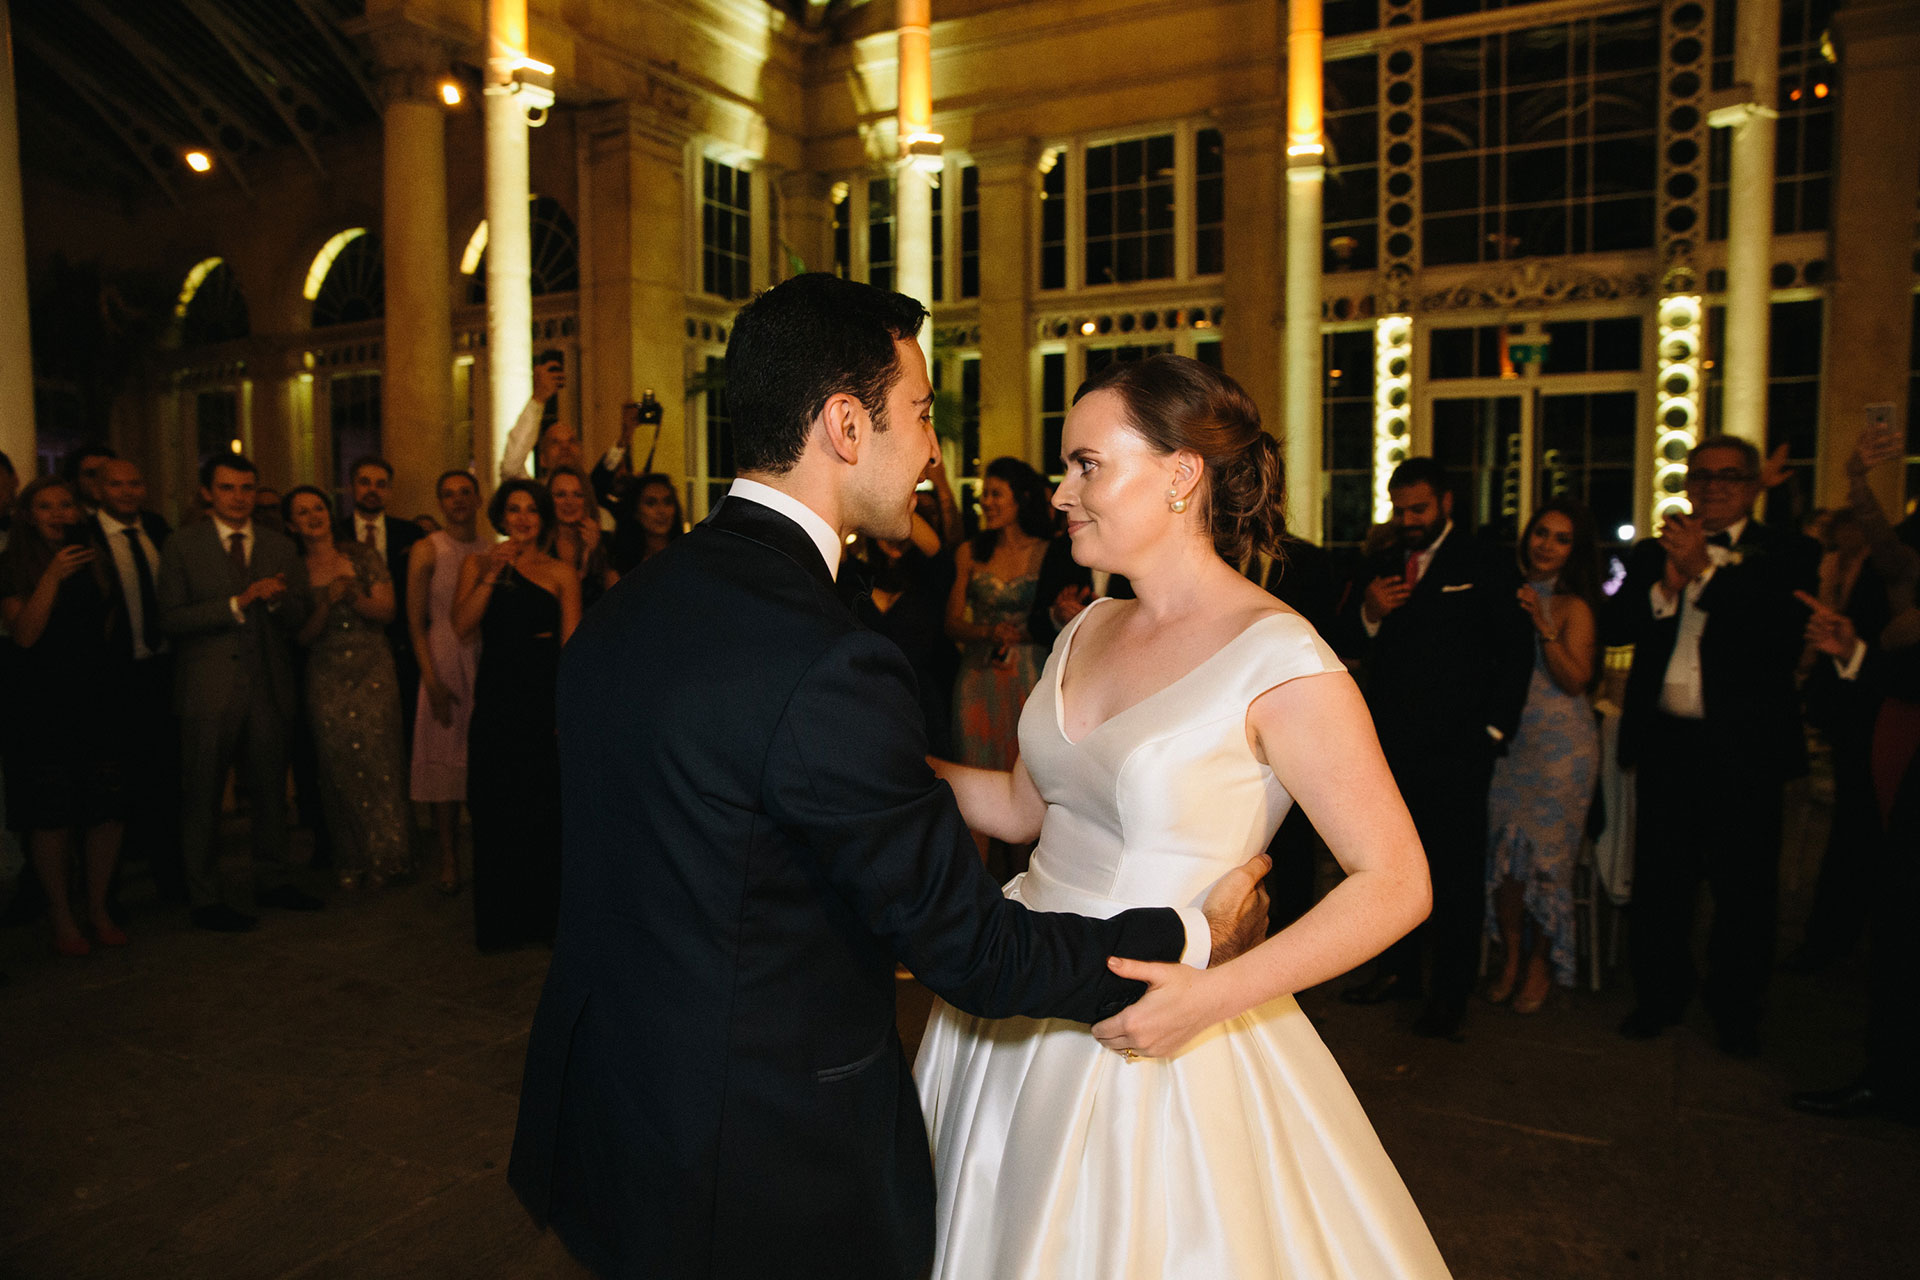 Syon-Park-Wedding-Photographer--_-Michael-Newington-Gray-812.jpg